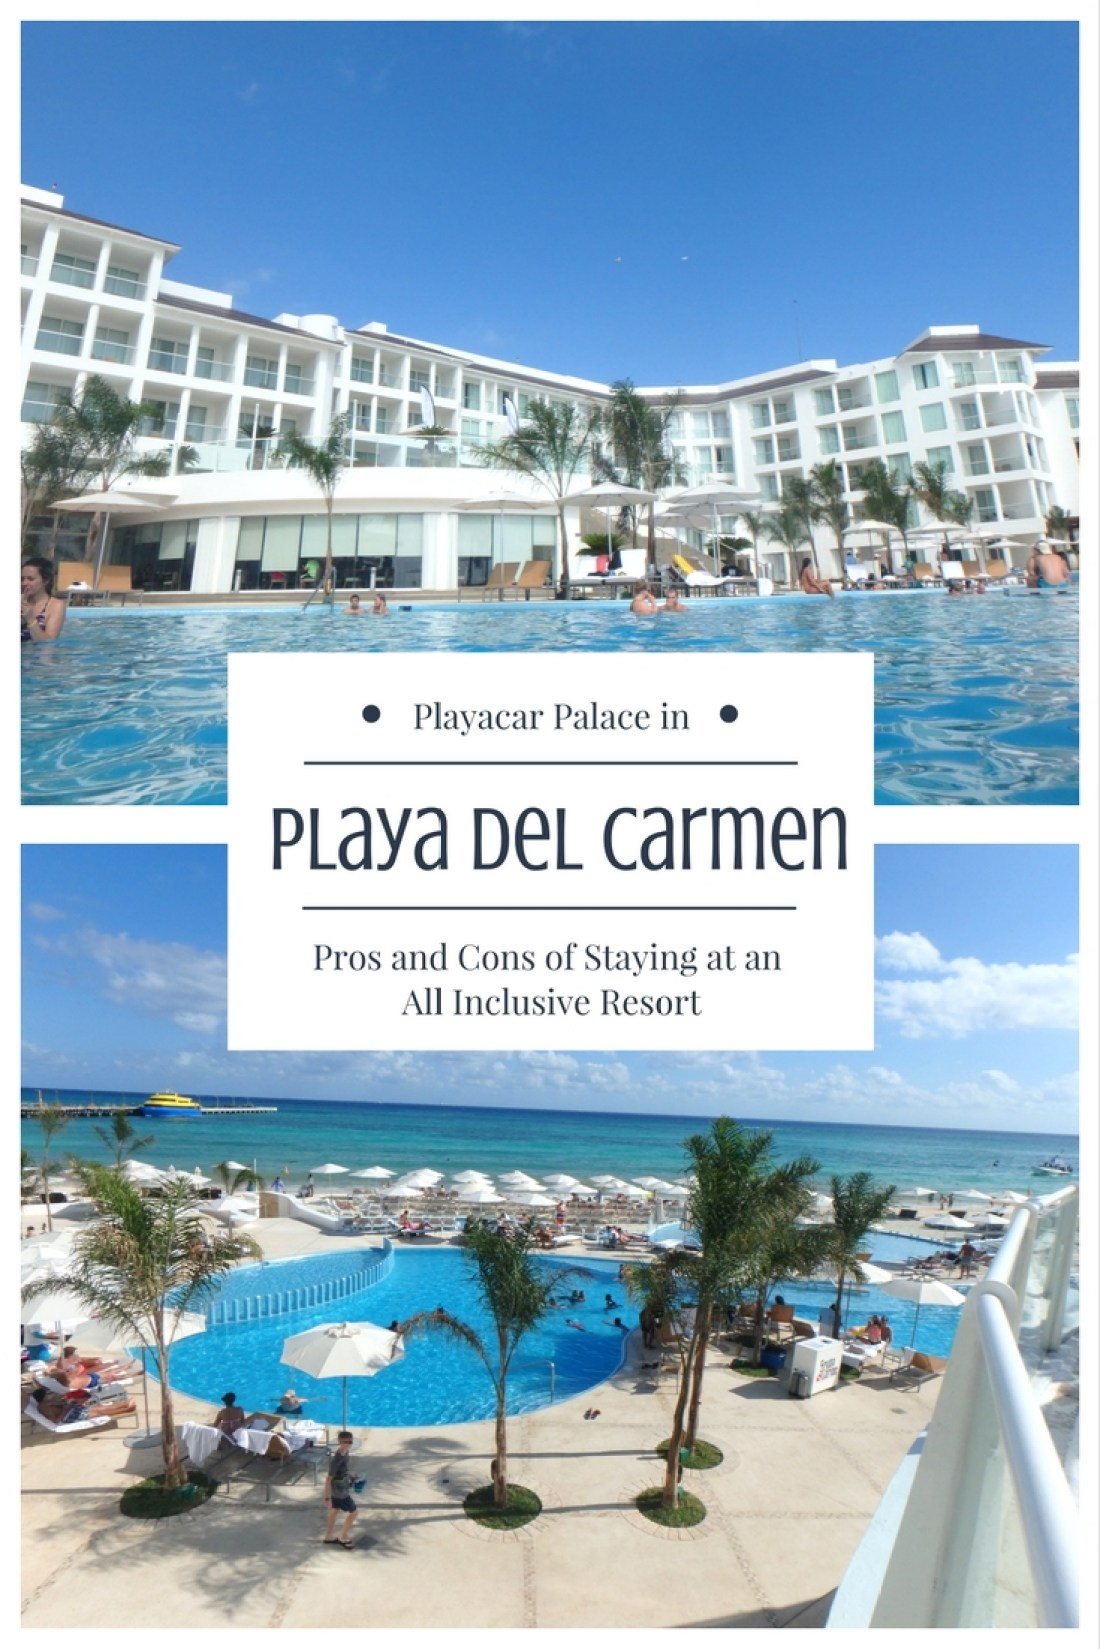 Playacar Palace in Playa Del Carmen review